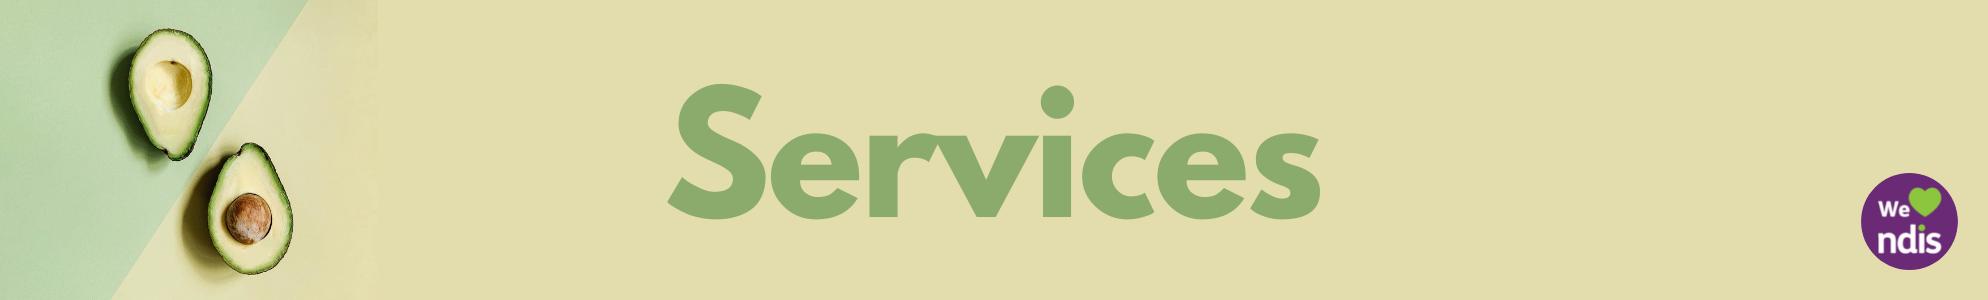 Services Hero Banner